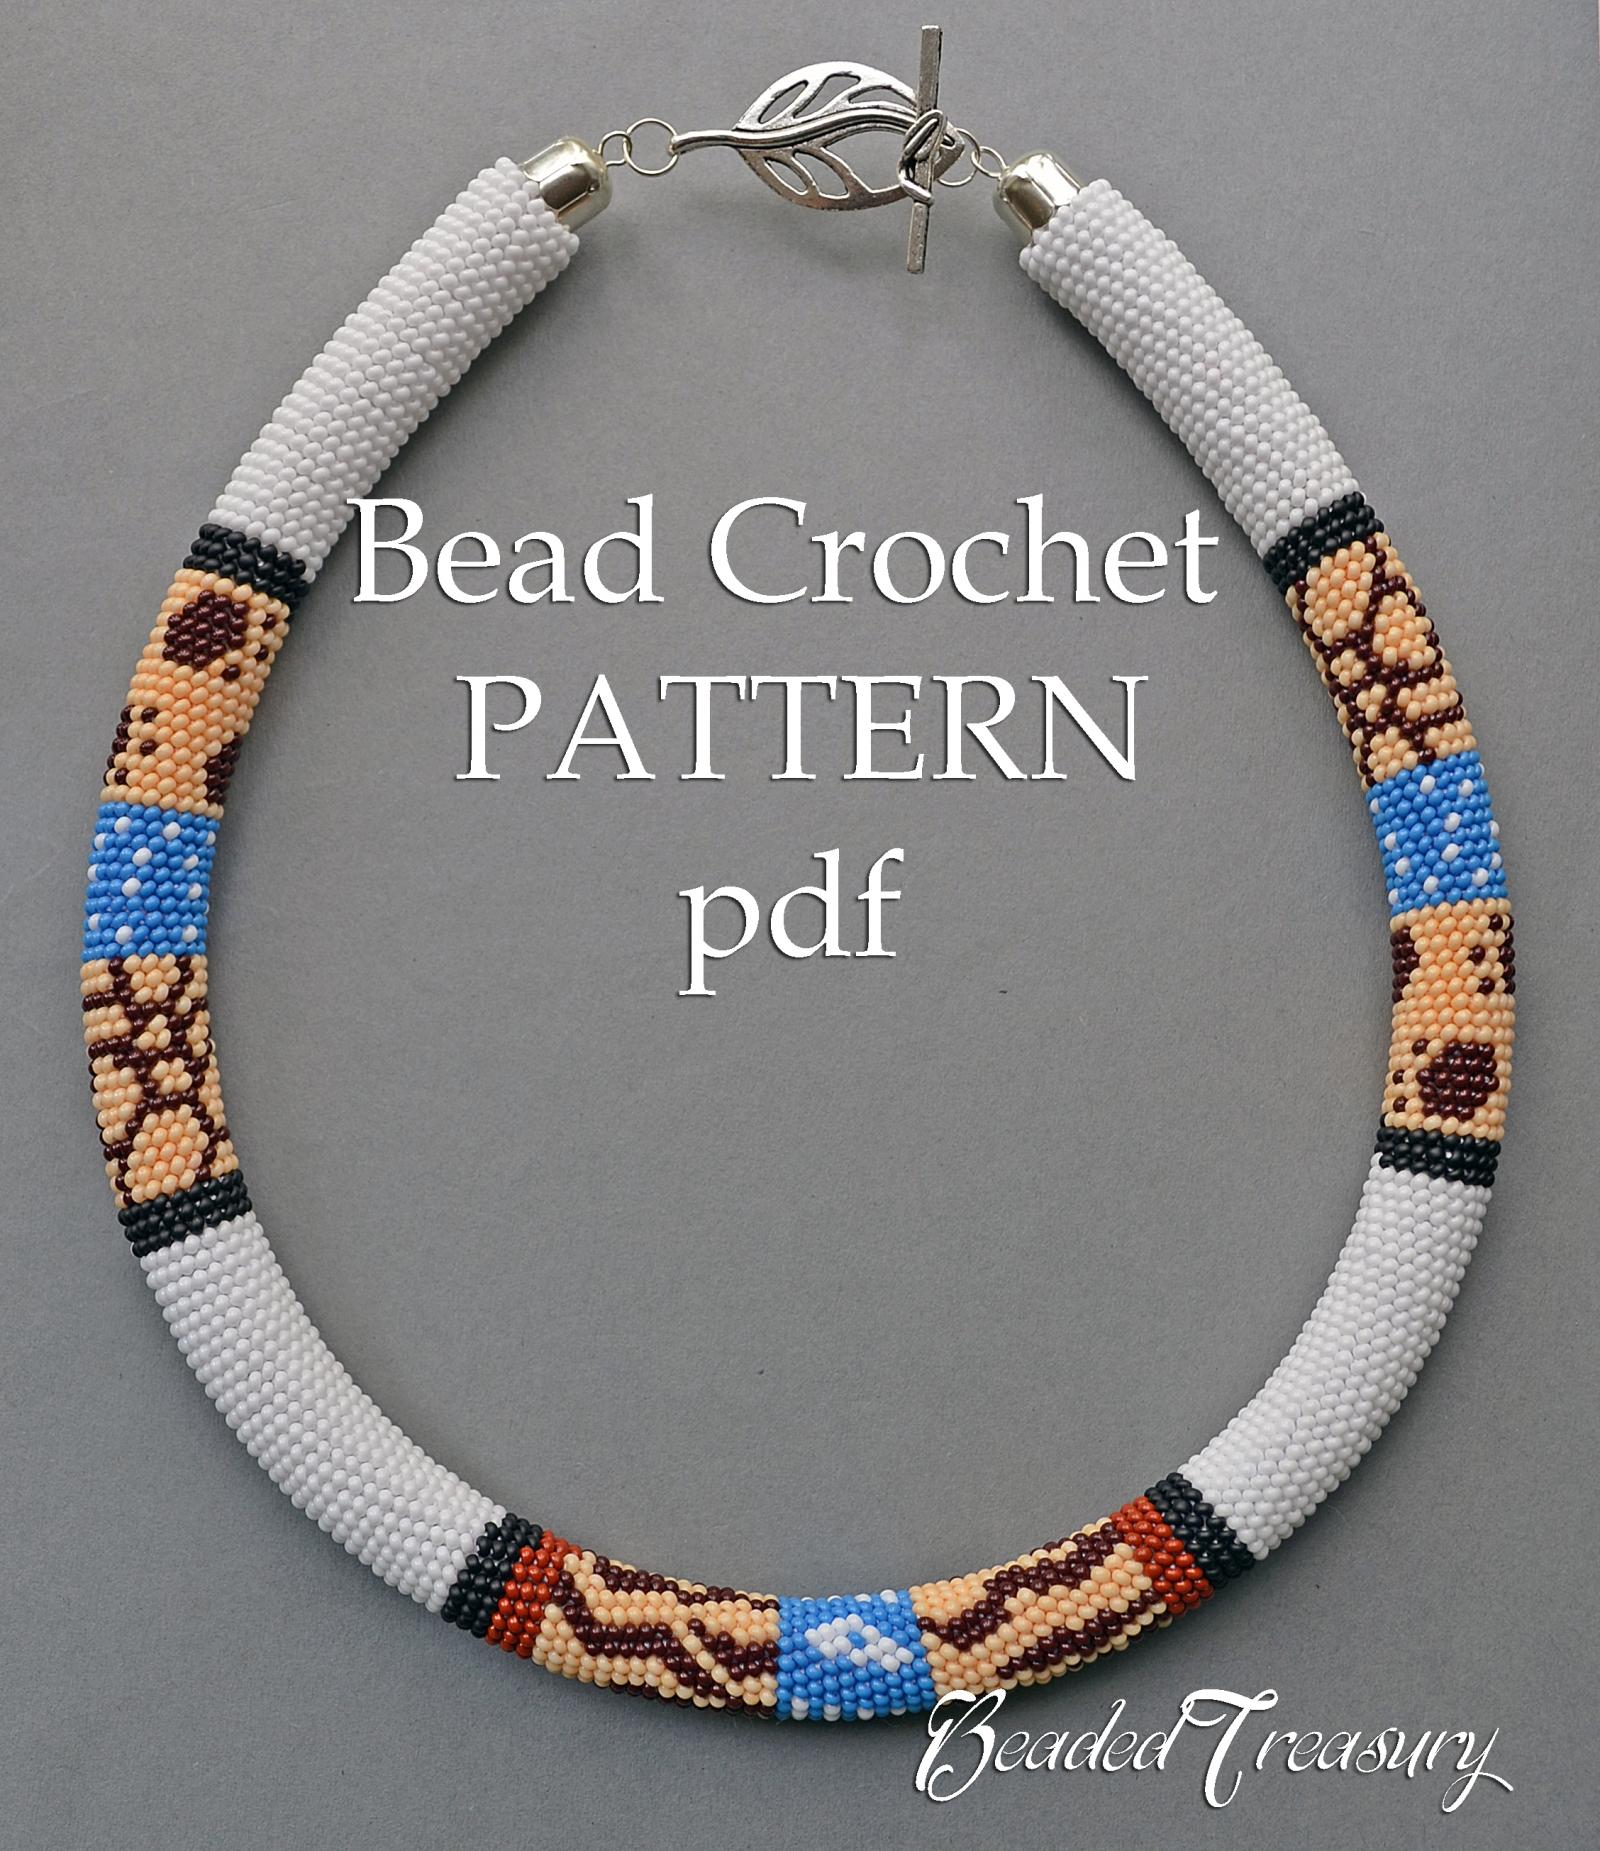 Safari Bead Crochet Necklace Pattern Bead Crochet Pattern